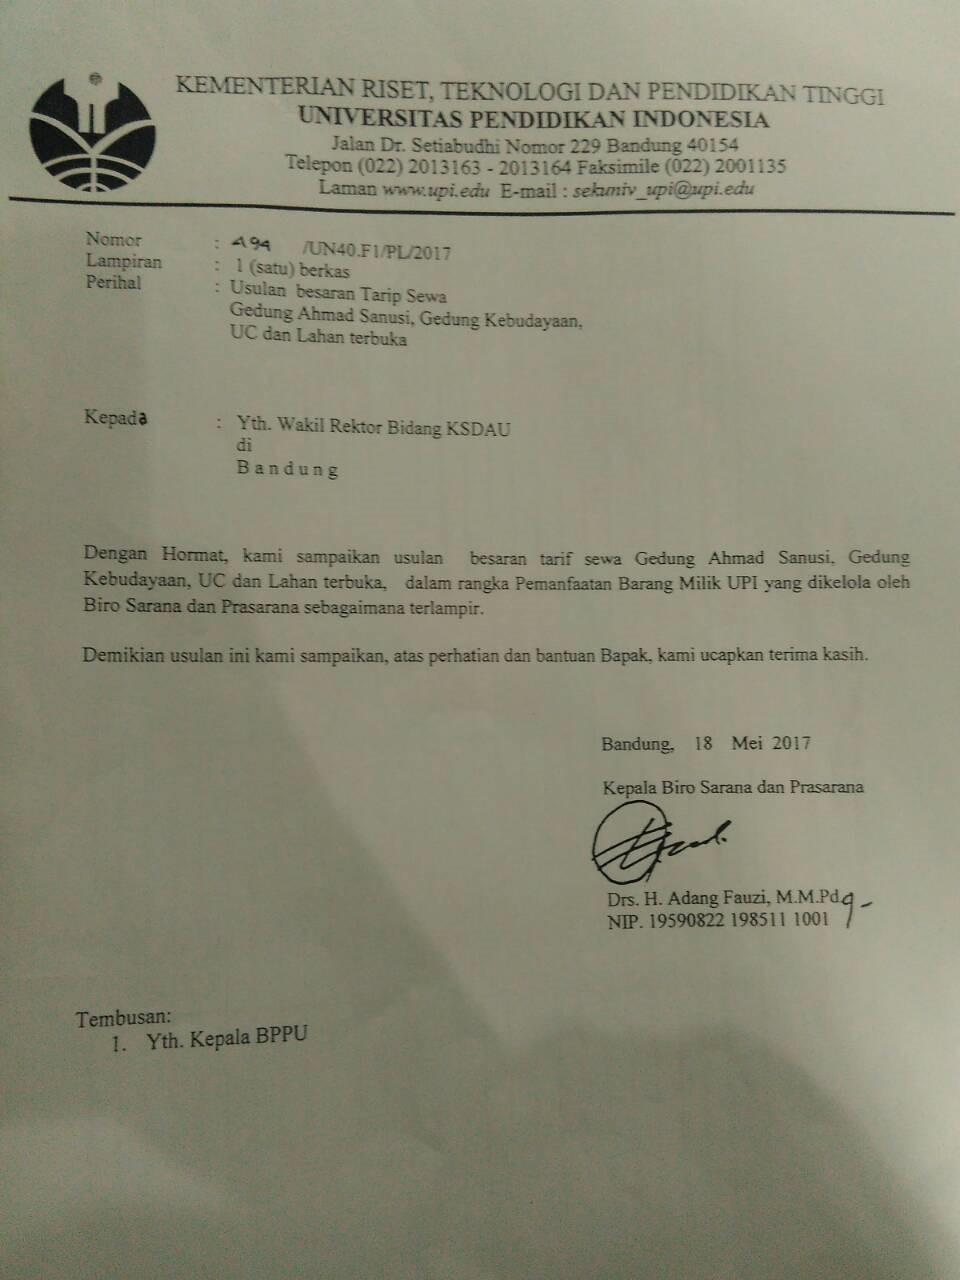 Lampiran 1. Surat usulan besaran tarif sewa Gedung Achmad Sanusi, Gd. Kebudayaan, UC, dan lahan terbuka